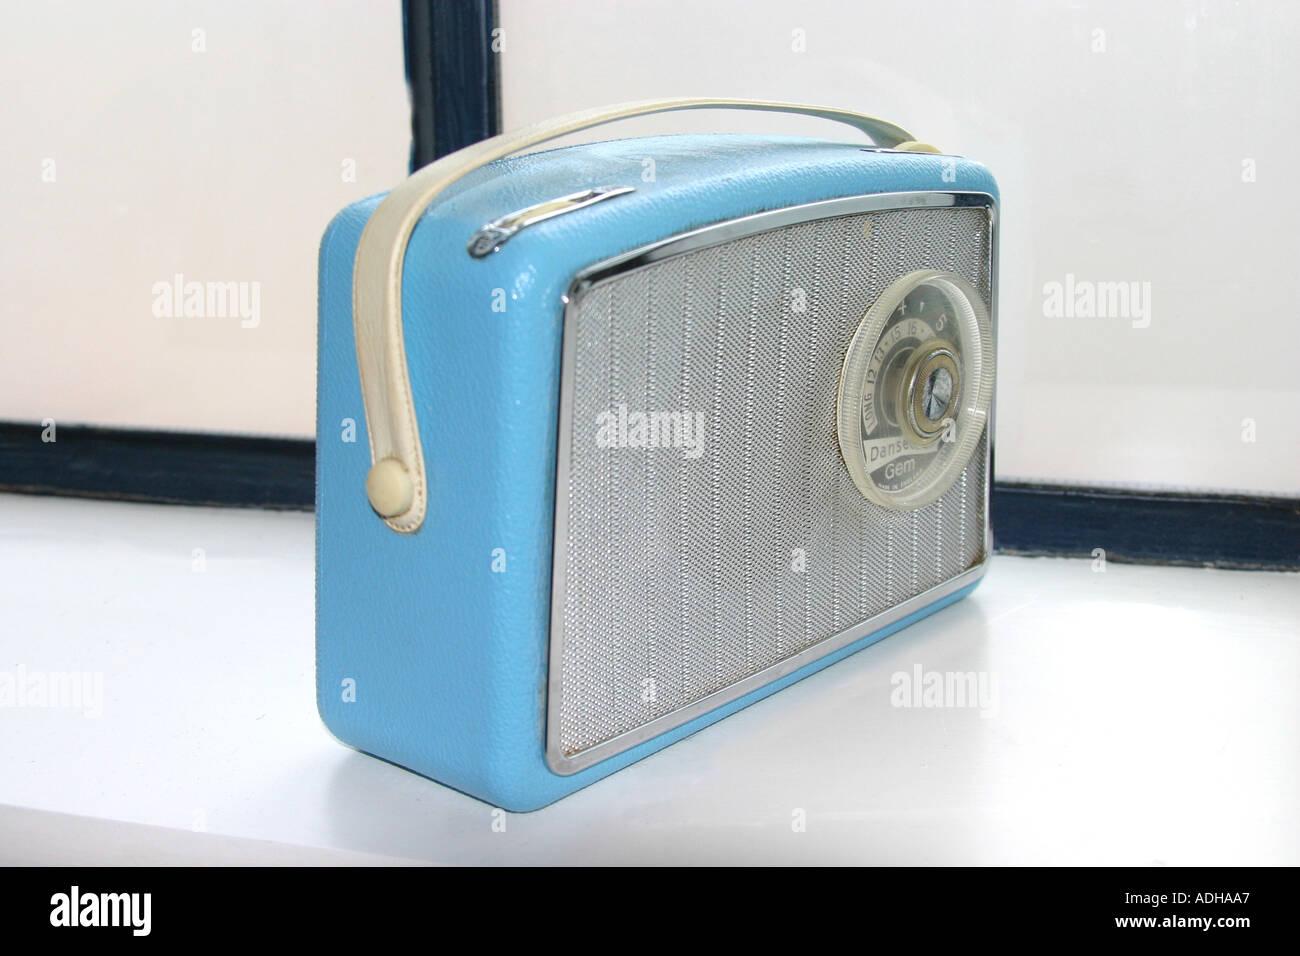 Retro Radio - Stock Image